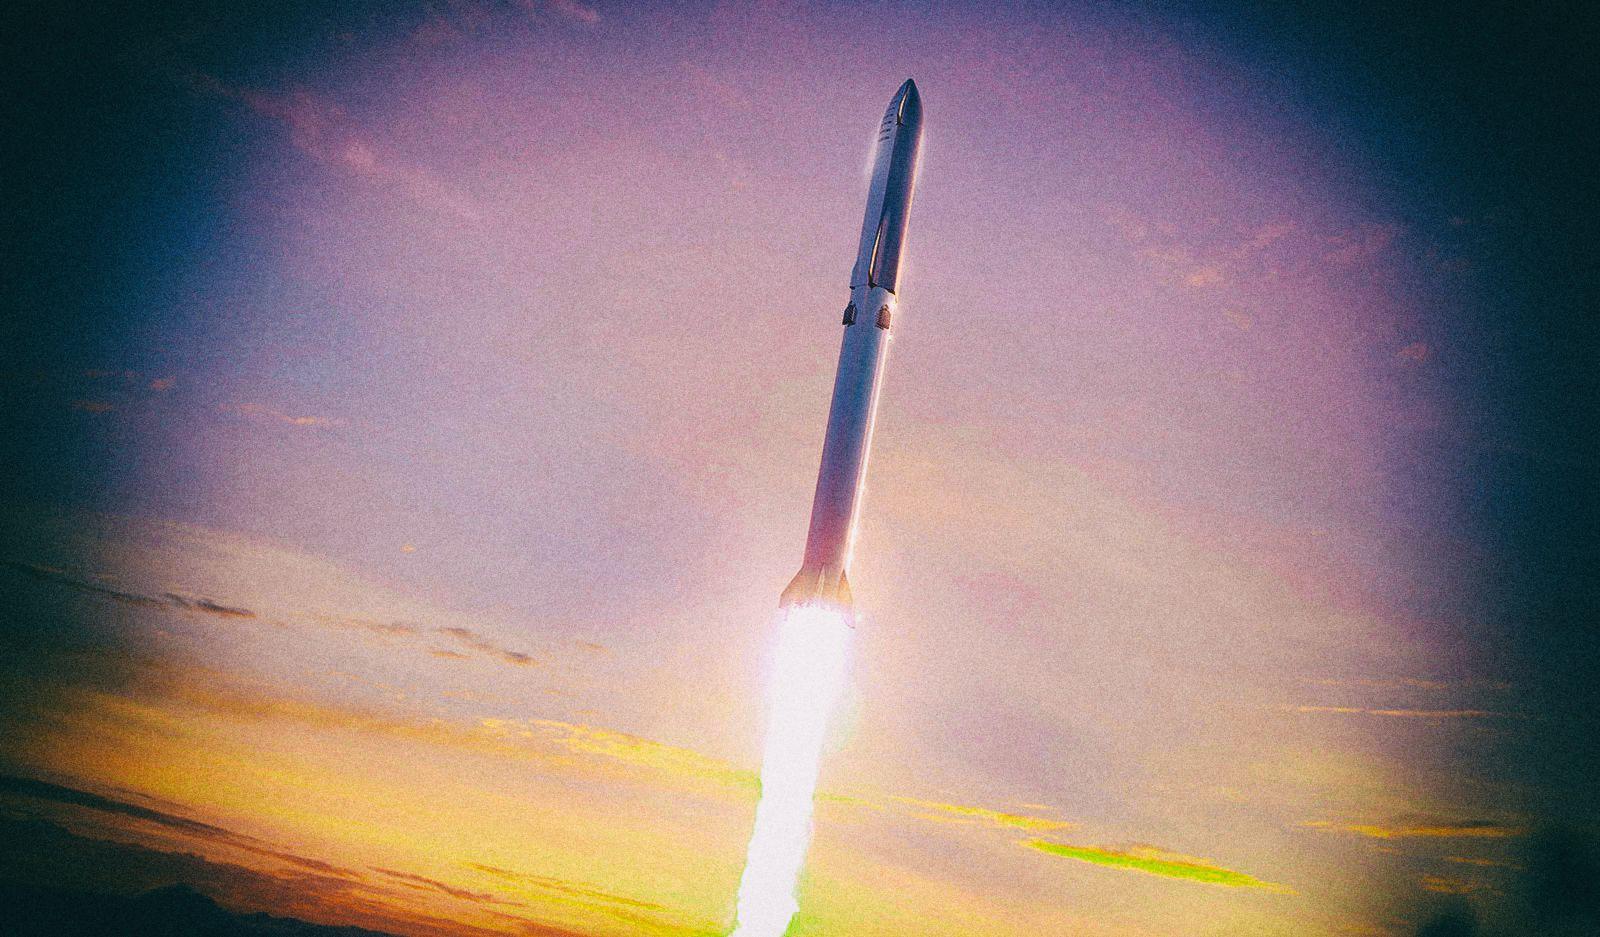 SpaceX попробует поймать гигантскую ракету при помощи клешни на башне